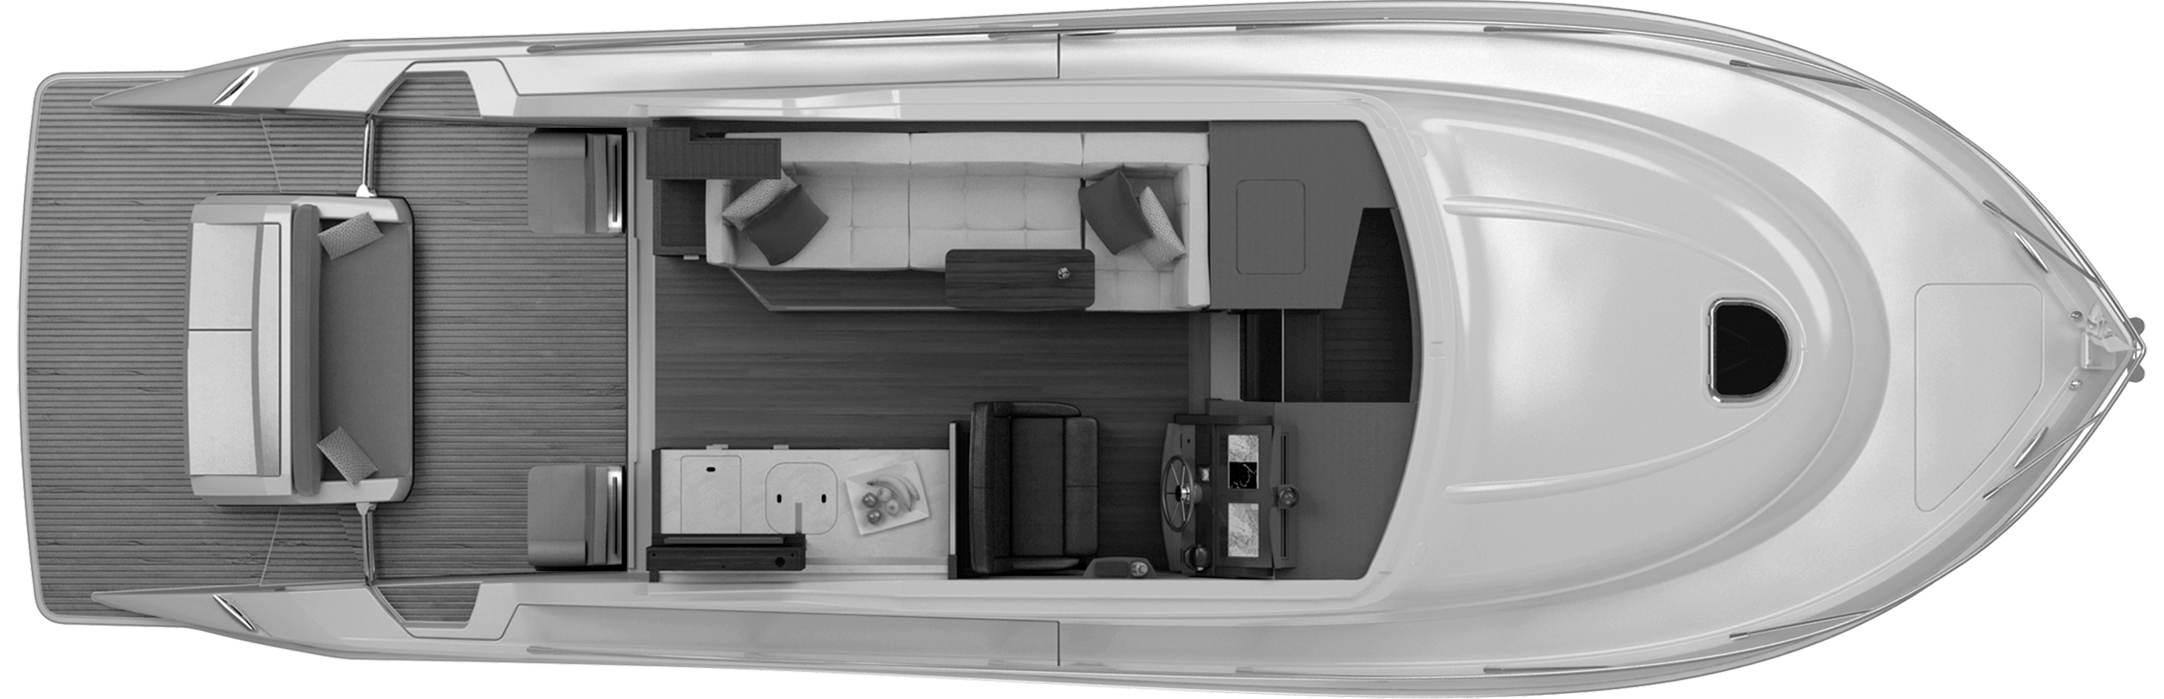 39 Coupe Floor Plan 2